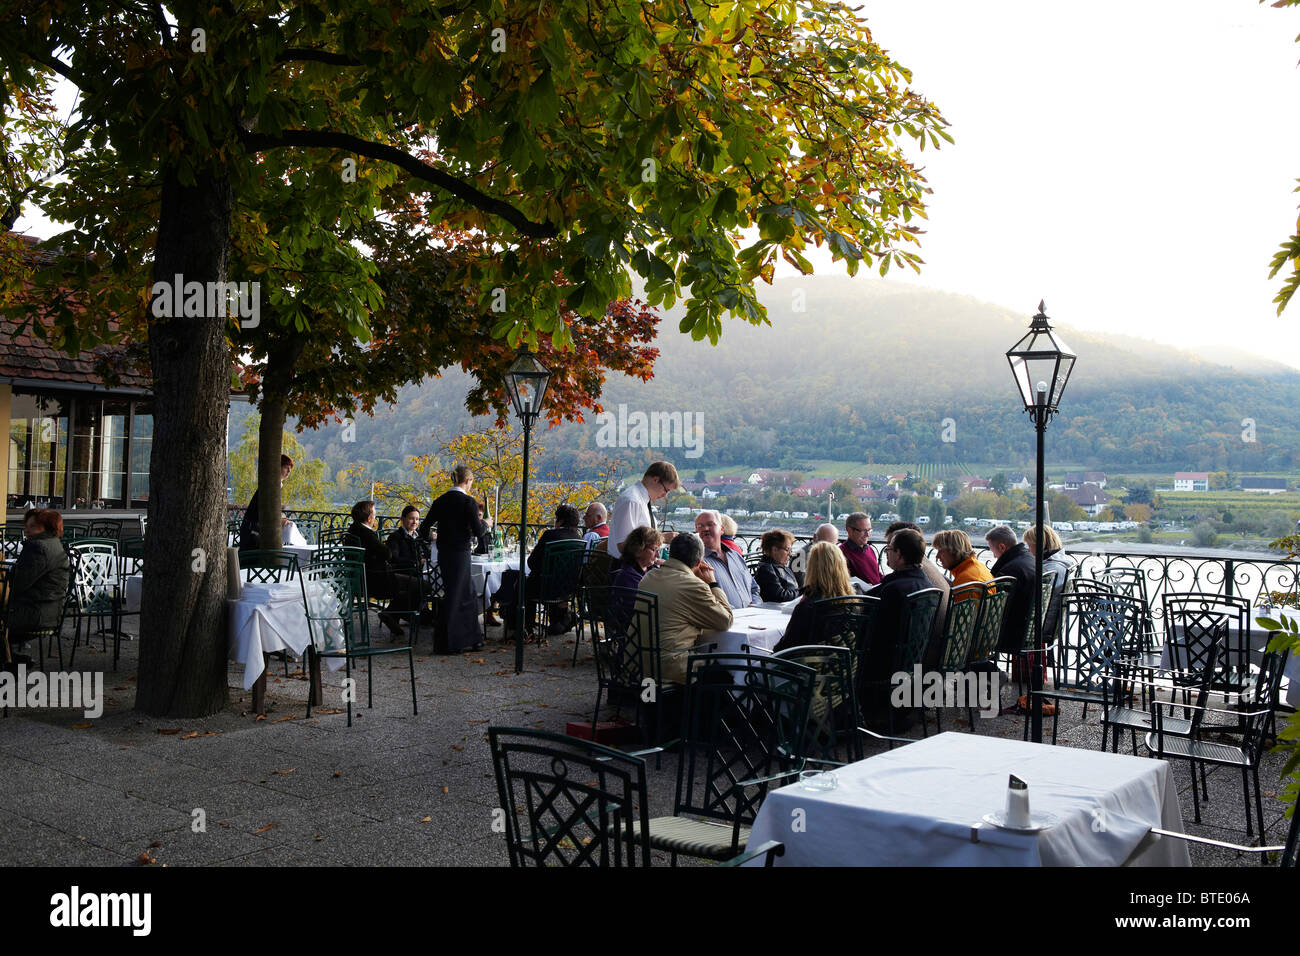 restaurant on terrace overlooking Danube river - Stock Image